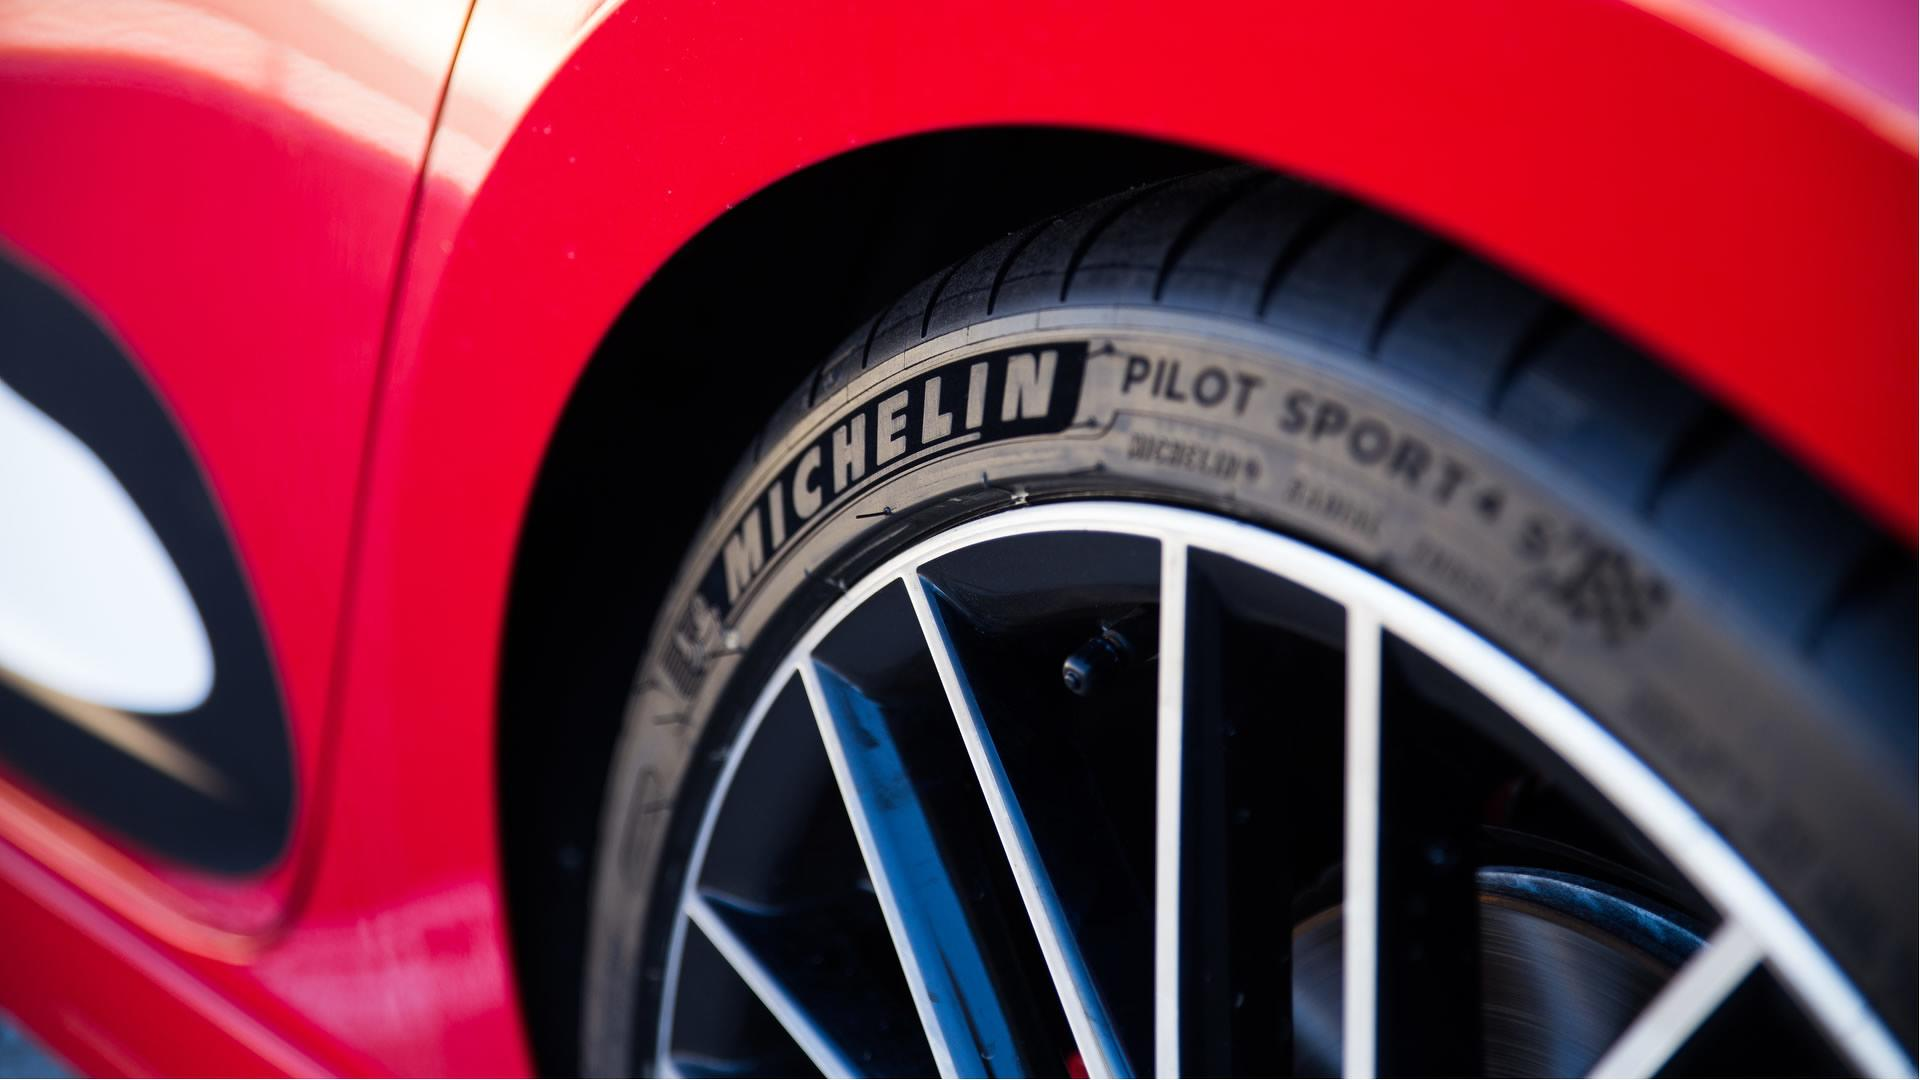 michelin lan a pneu pilot sport 4 s para superesportivos. Black Bedroom Furniture Sets. Home Design Ideas